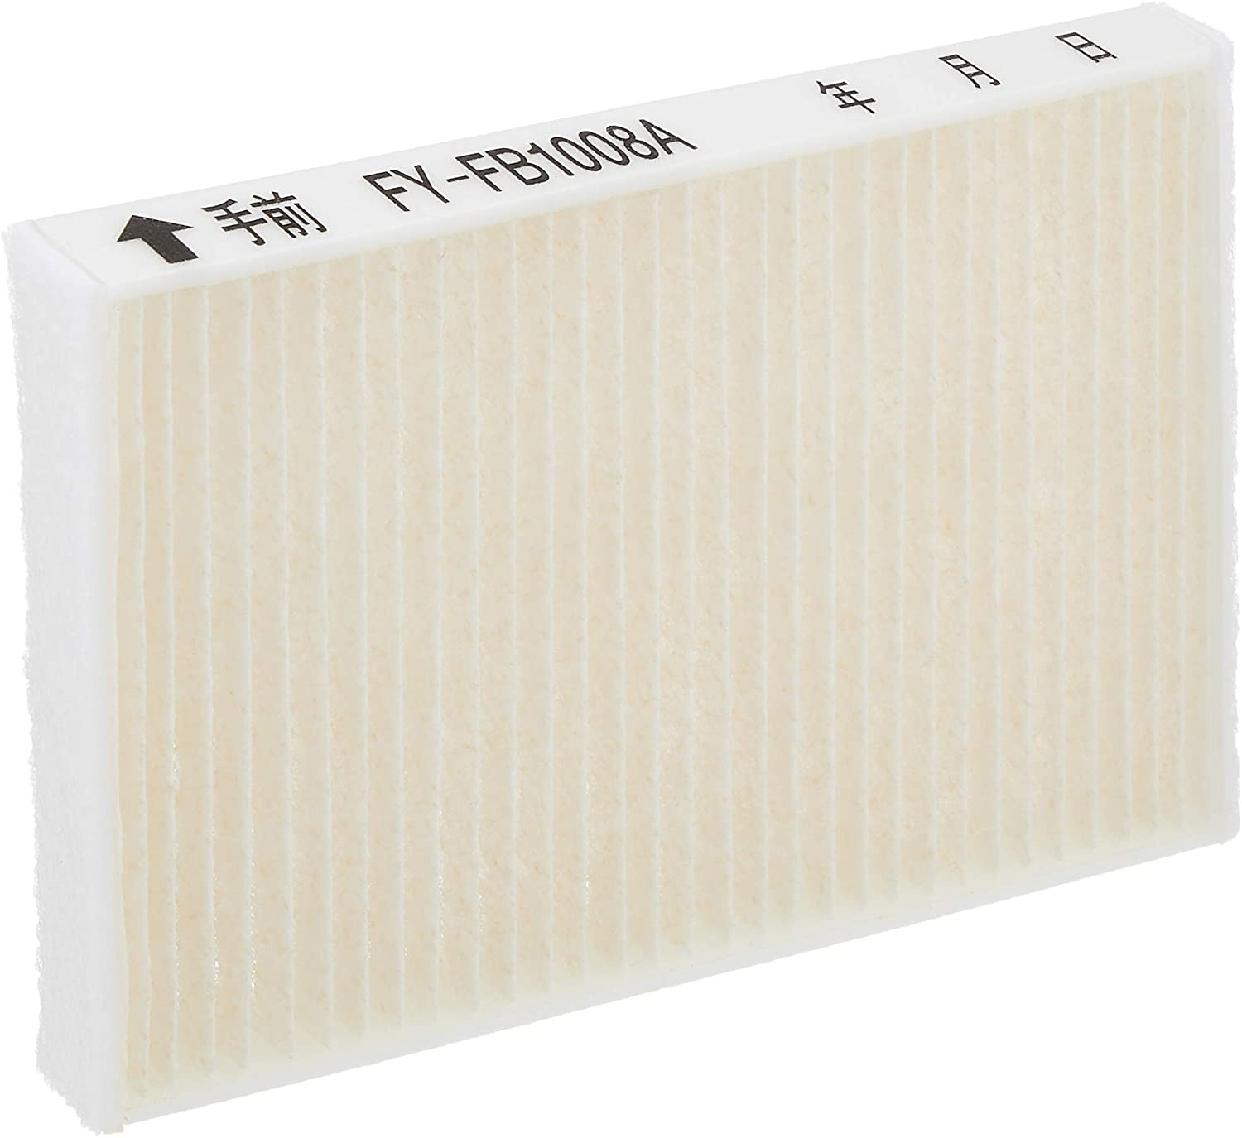 Panasonic(パナソニック)交換用給気清浄フィルター 1枚入 FY-FB1008Aの商品画像